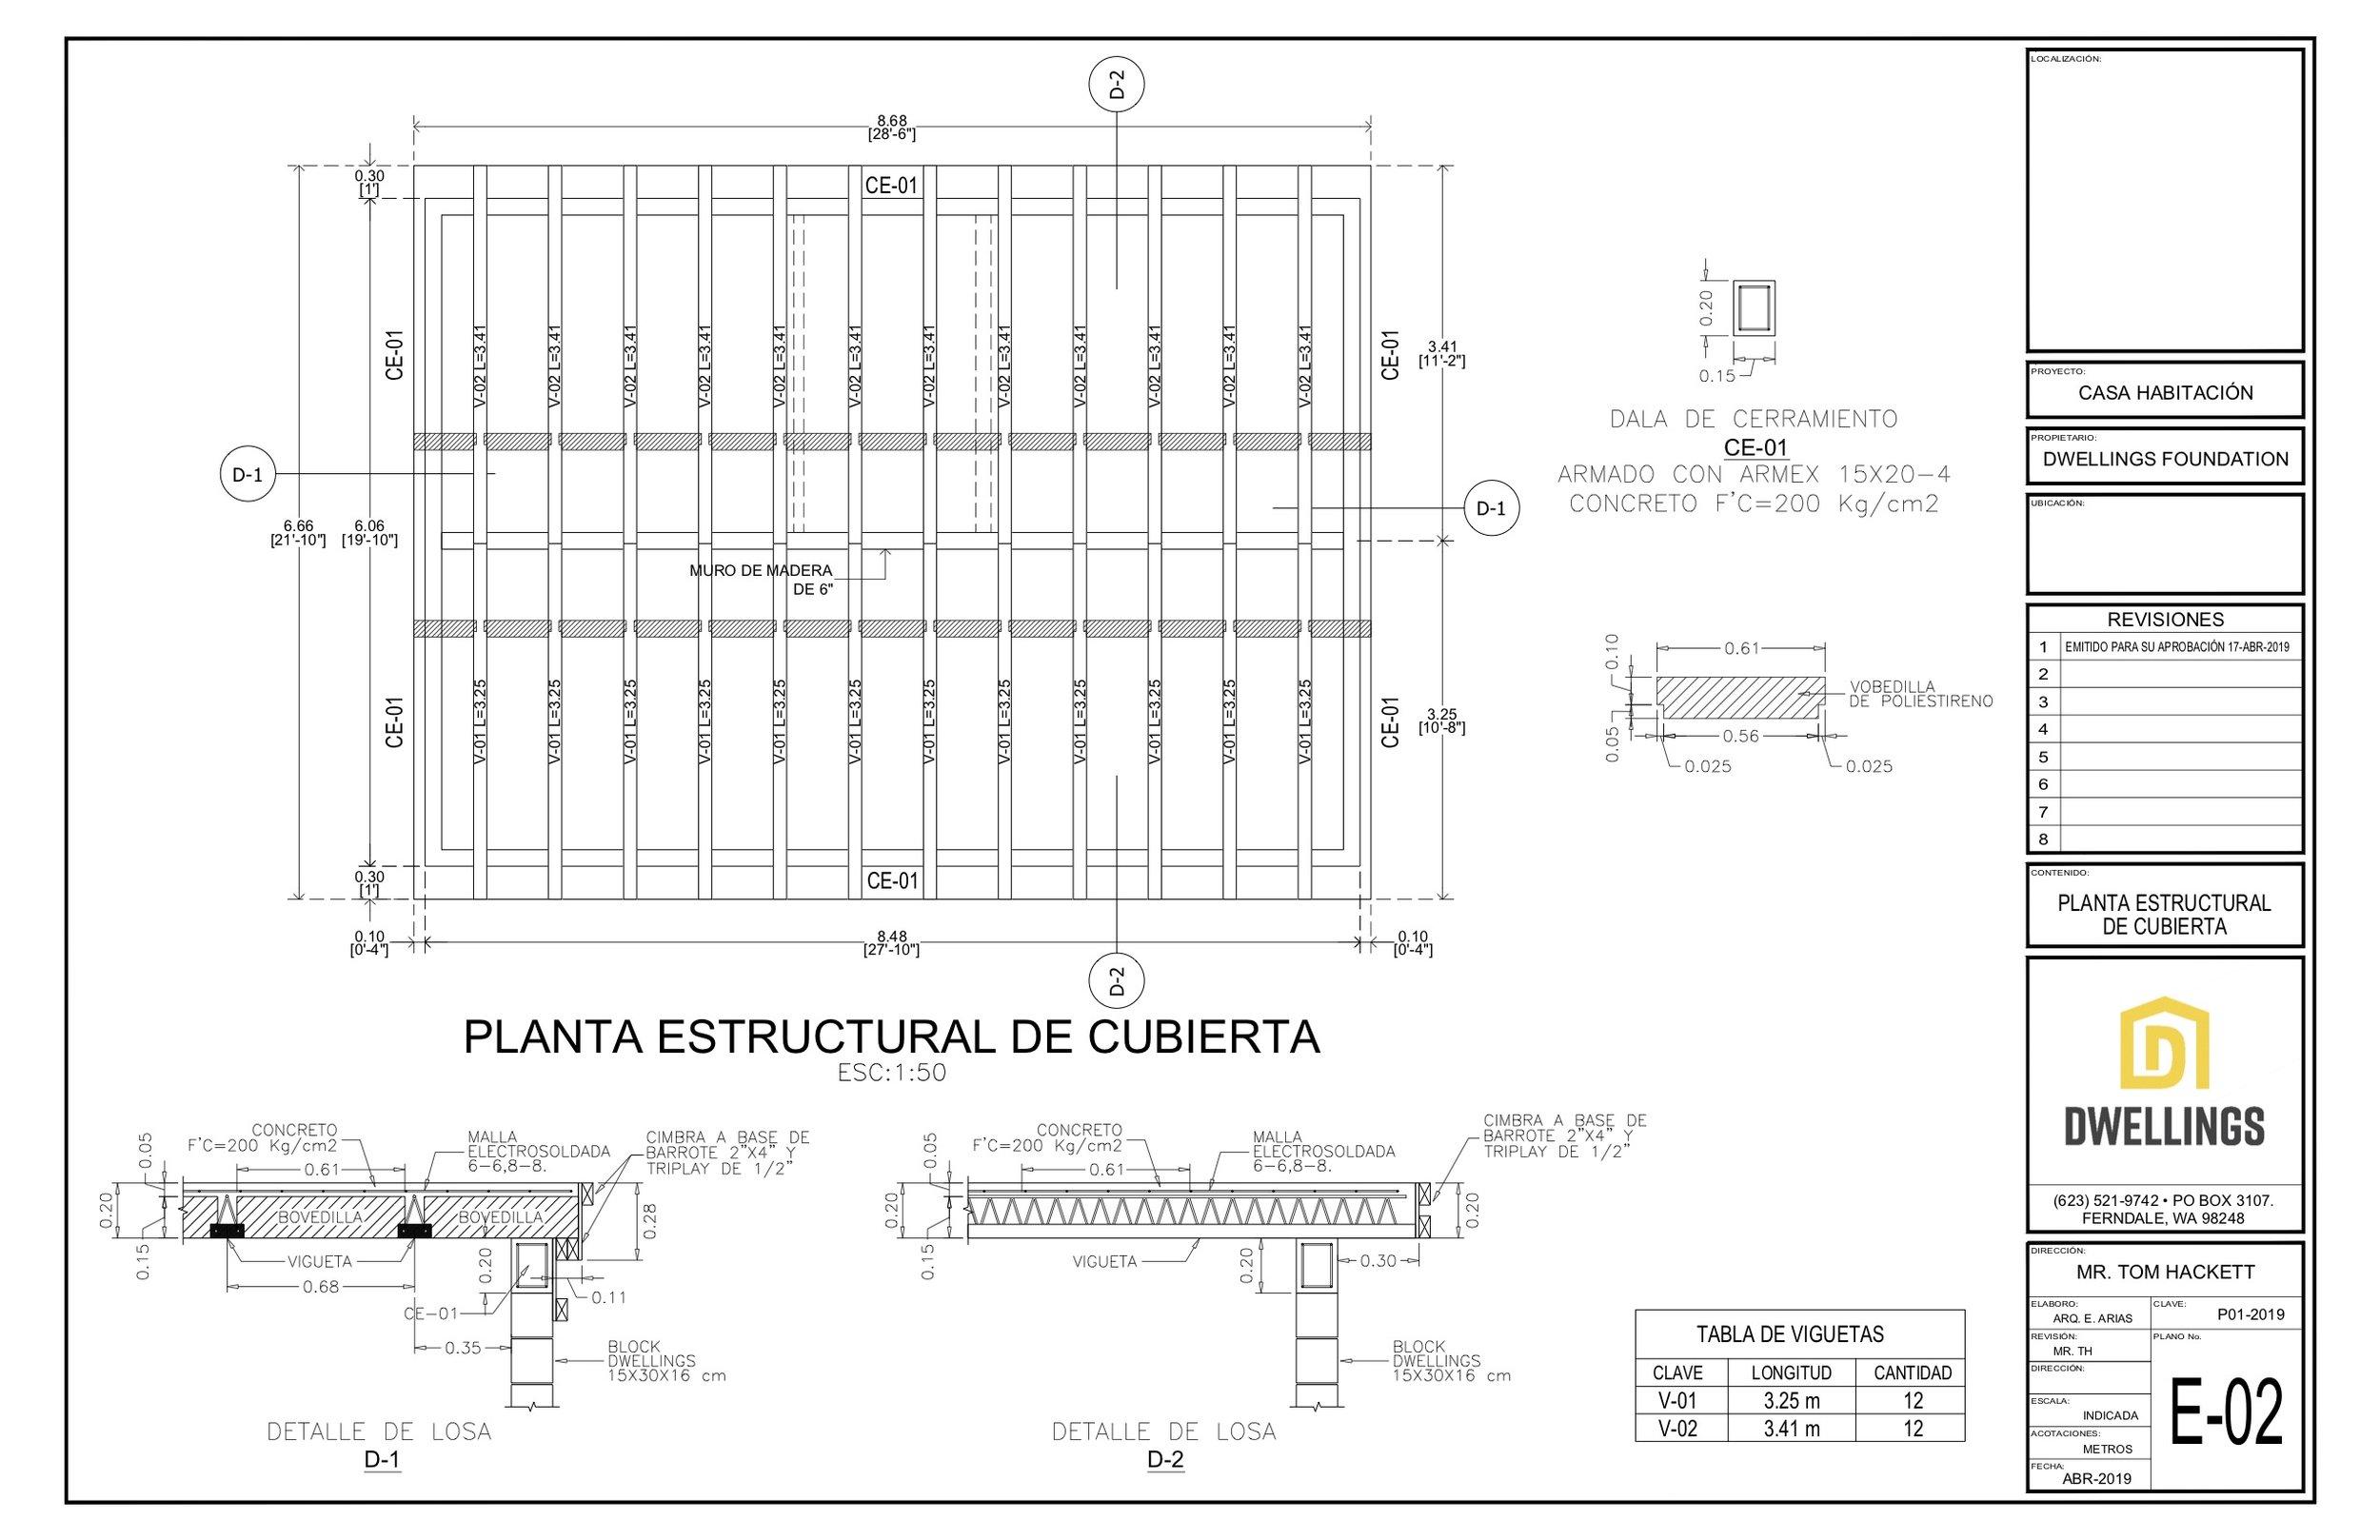 E-02 Estructural de Cubierta.jpg